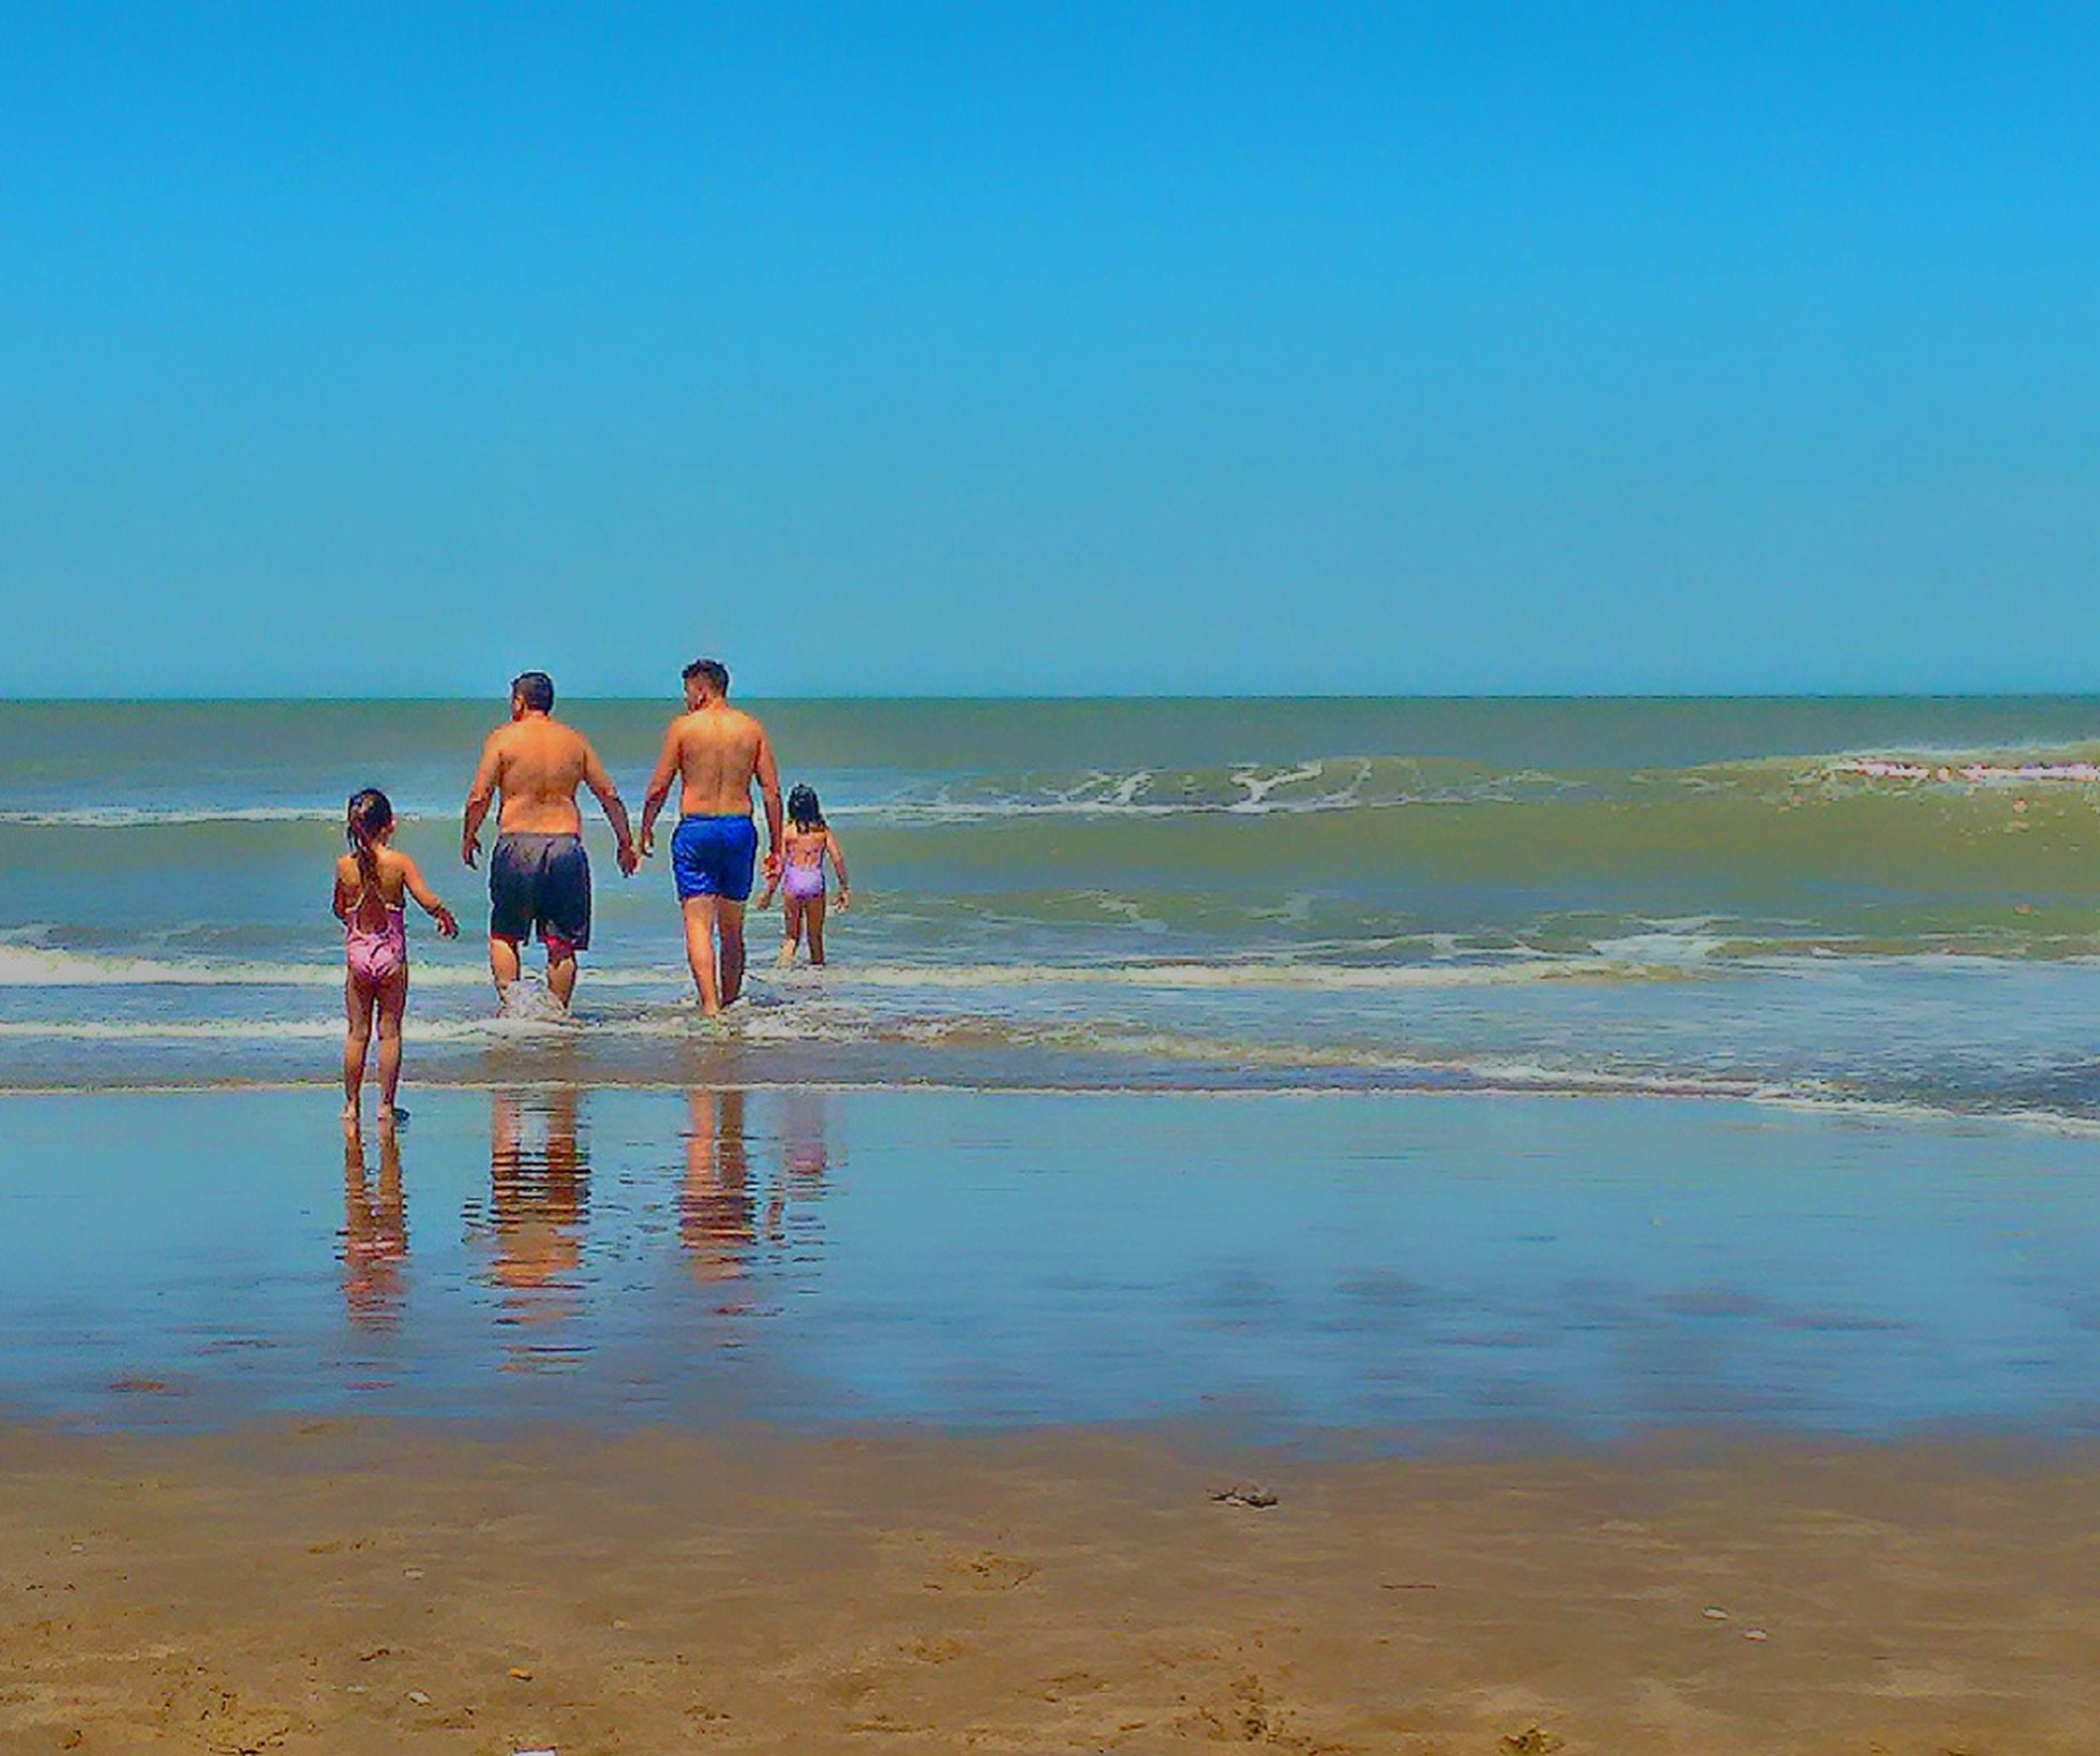 Playa Sun Summer Water Vacations Beach Sea Sand Beachandsand Buenos Aires Argentina Pinamar 2016 Mare Lacosta Spiaggia Sole Argentina Photography